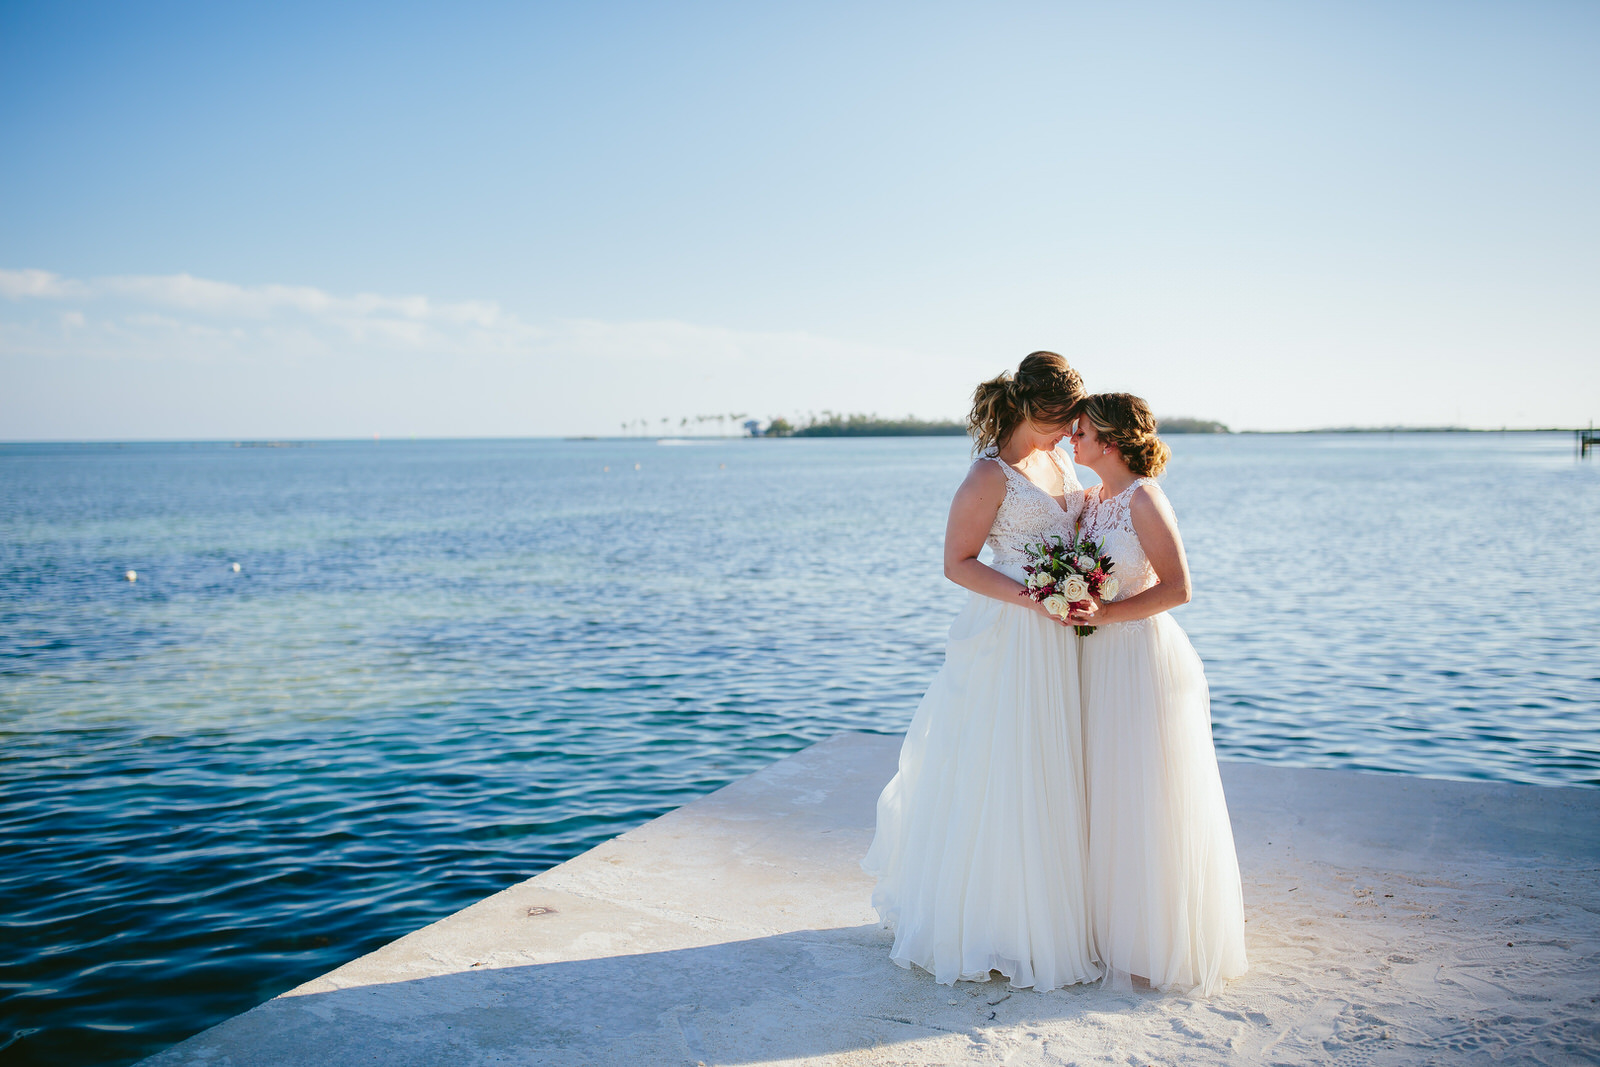 brides_by_the_sea.jpg